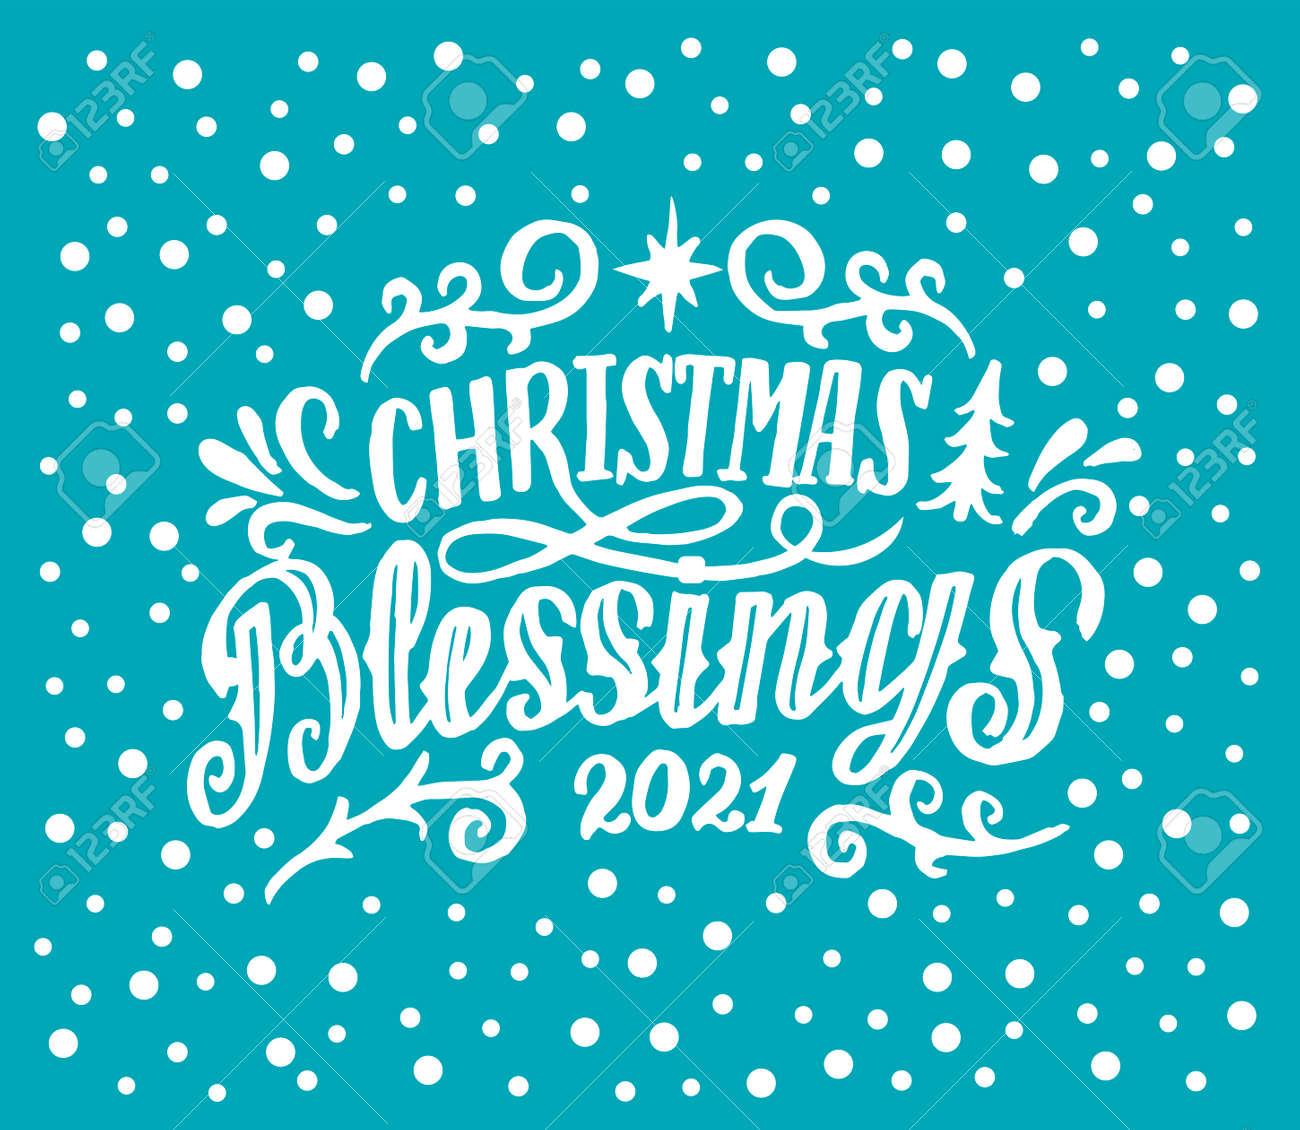 Hand lettering Christmas Blessings 2021 on blue background. - 157917653